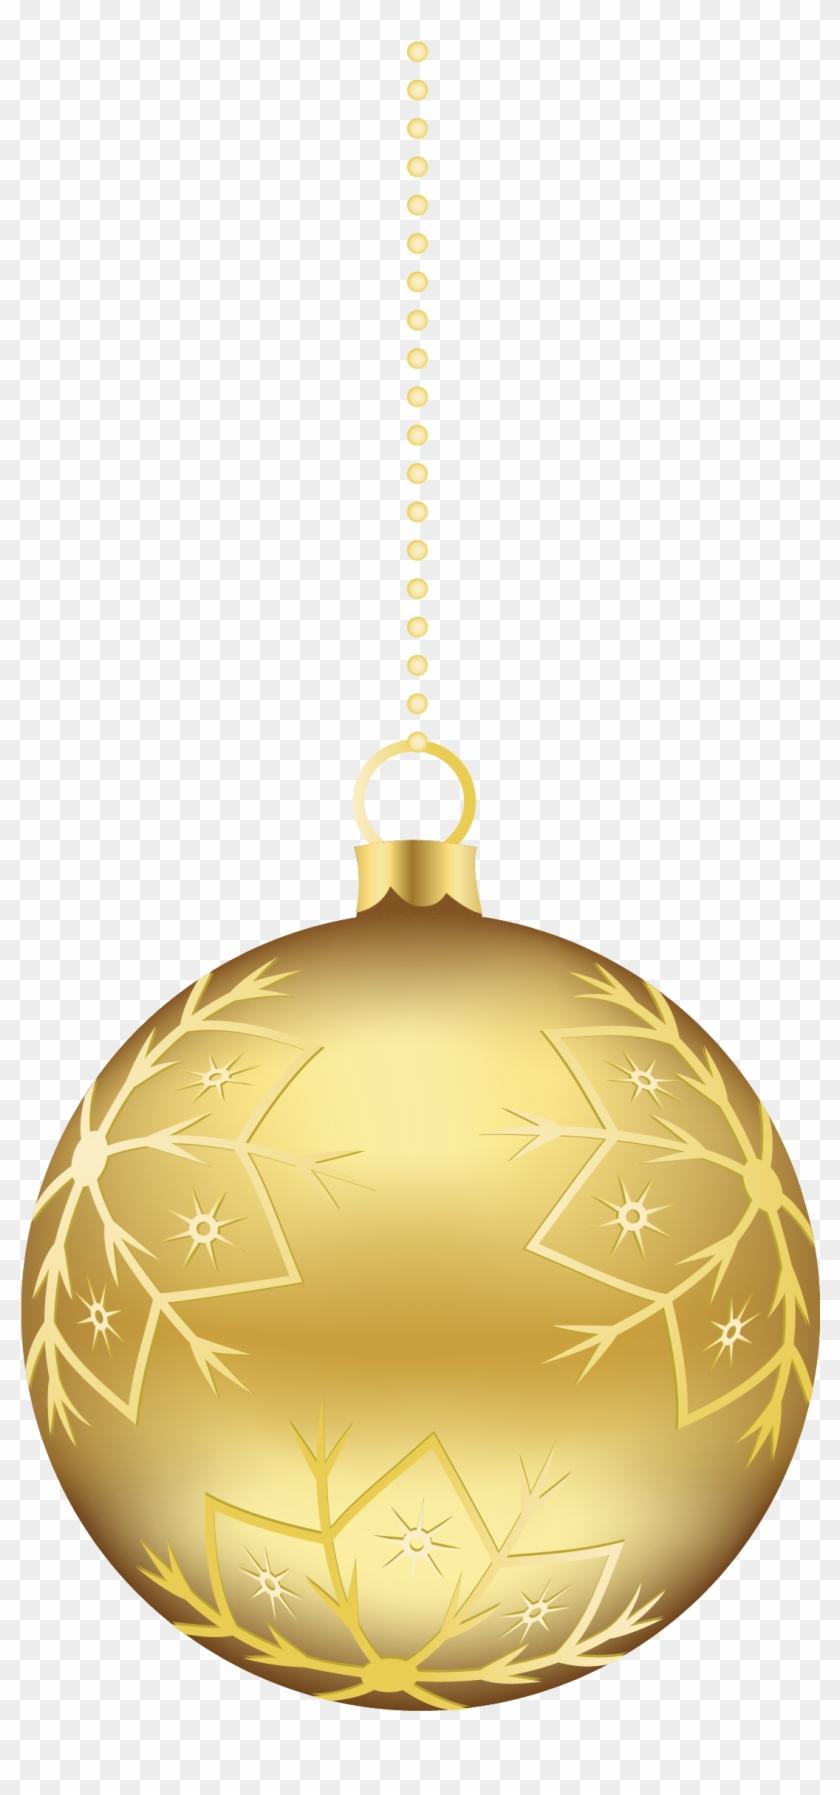 Gold Christmas Ornaments Hanging Gold Christmas Balls Hd Png